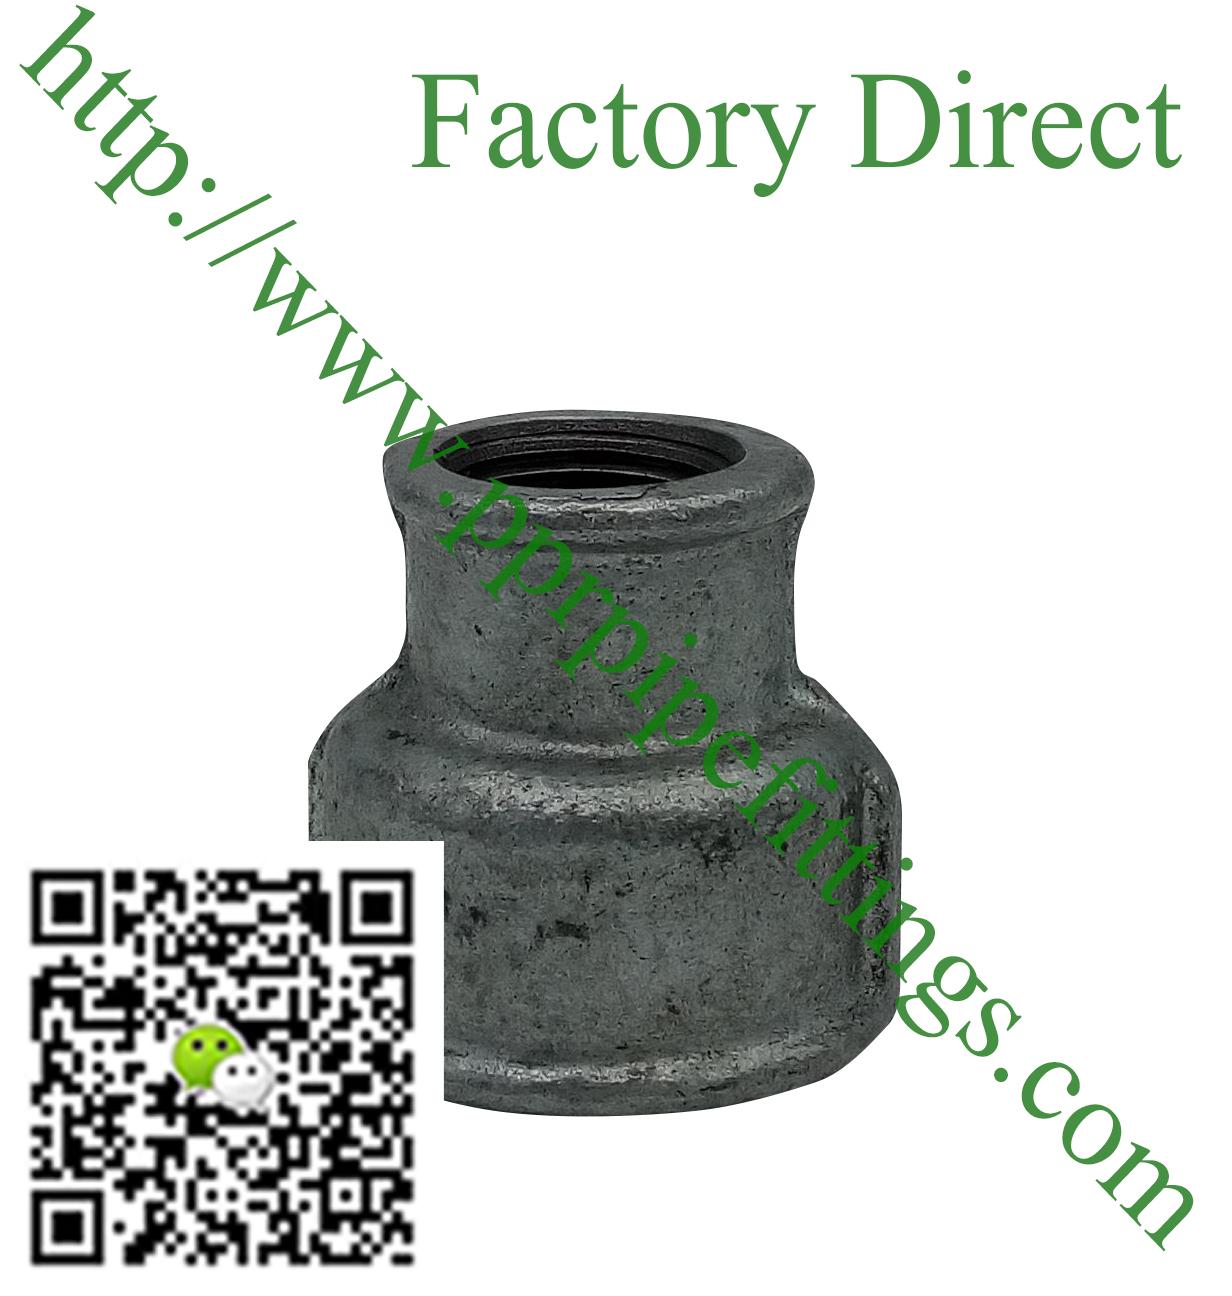 hot dipped beaded cast iron fittings reducing socket